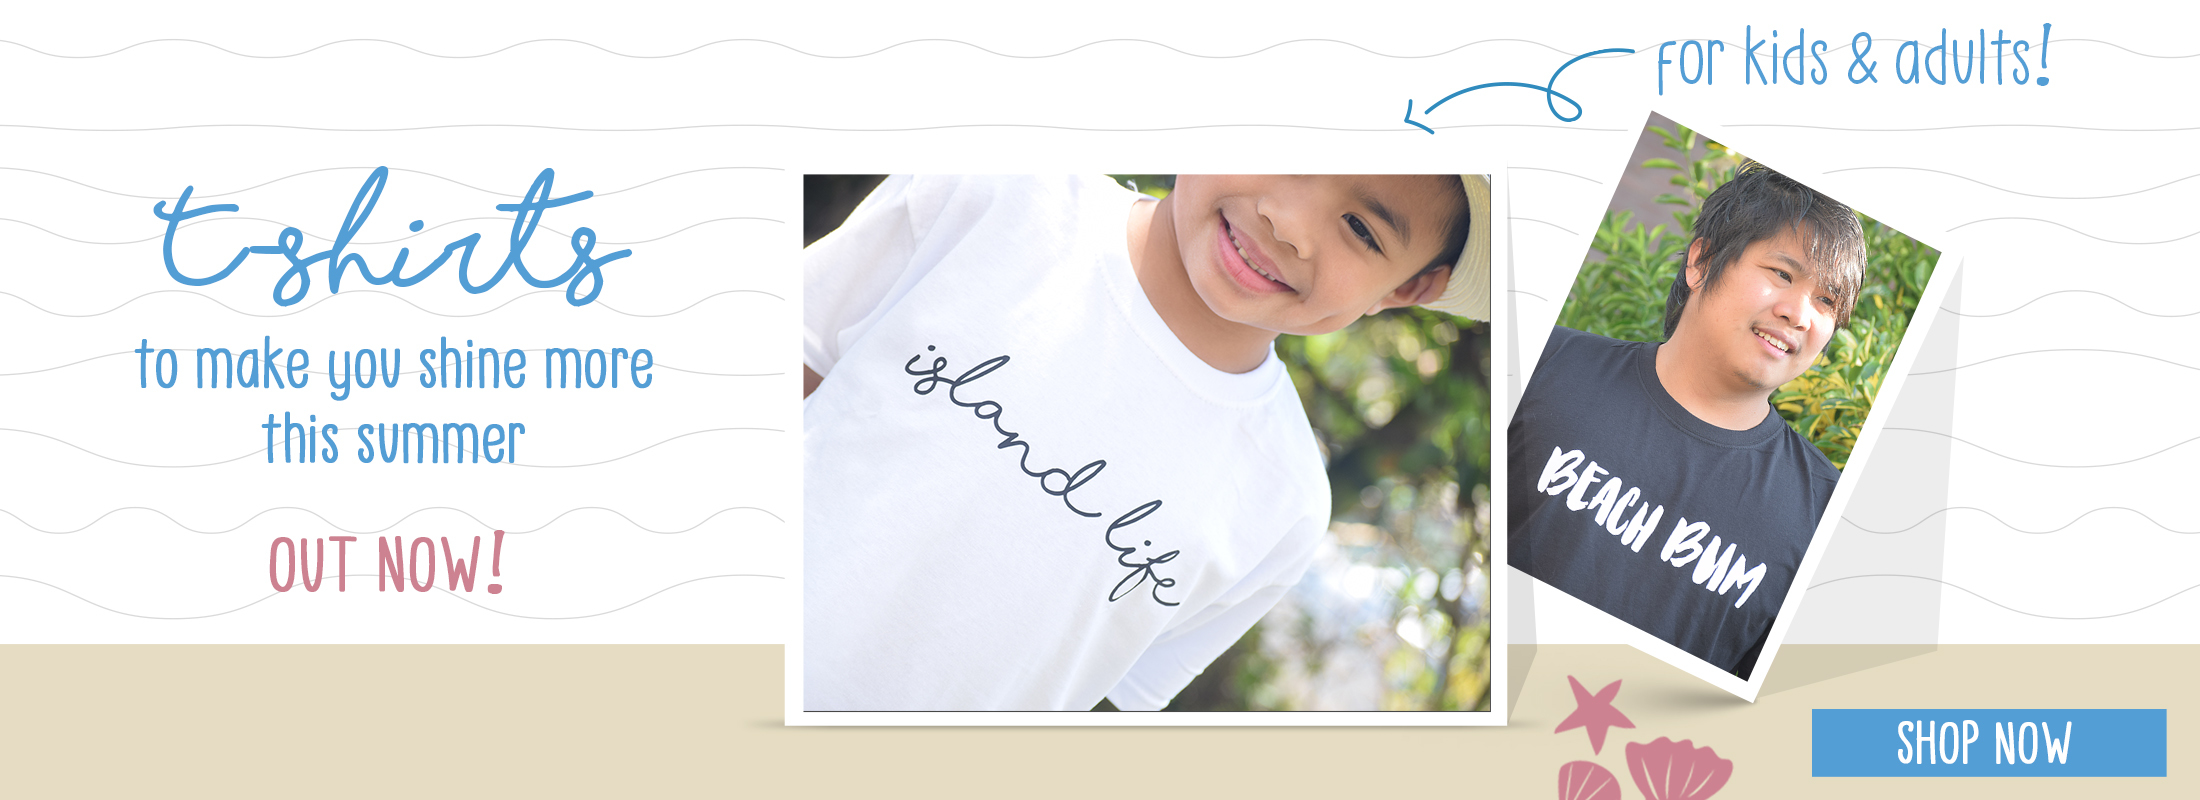 Cacaiva Island t-shirts